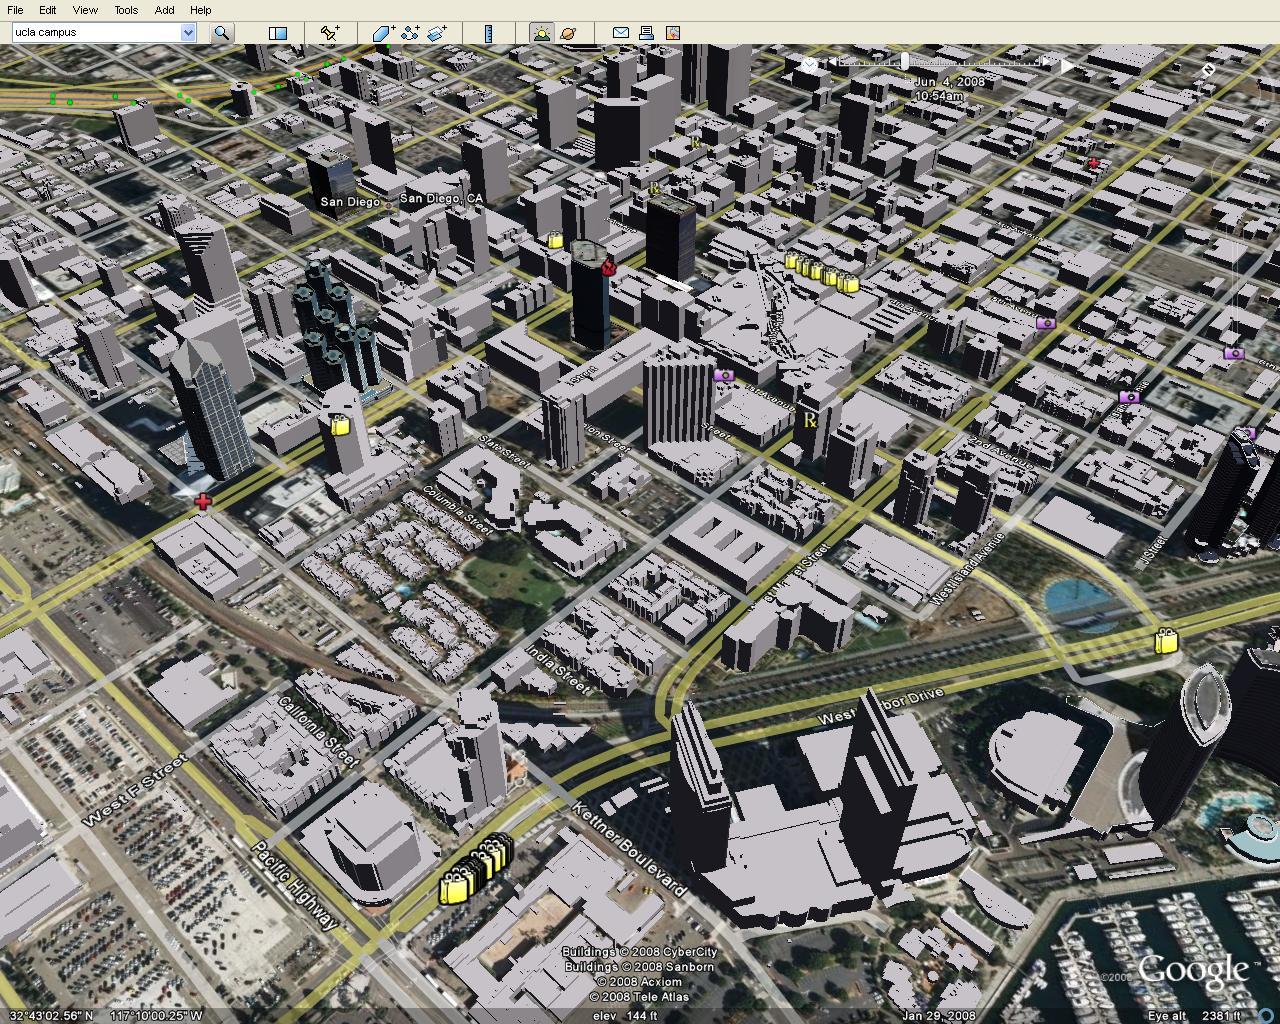 San Diego City Center 3d City Model Lands On Google Earth